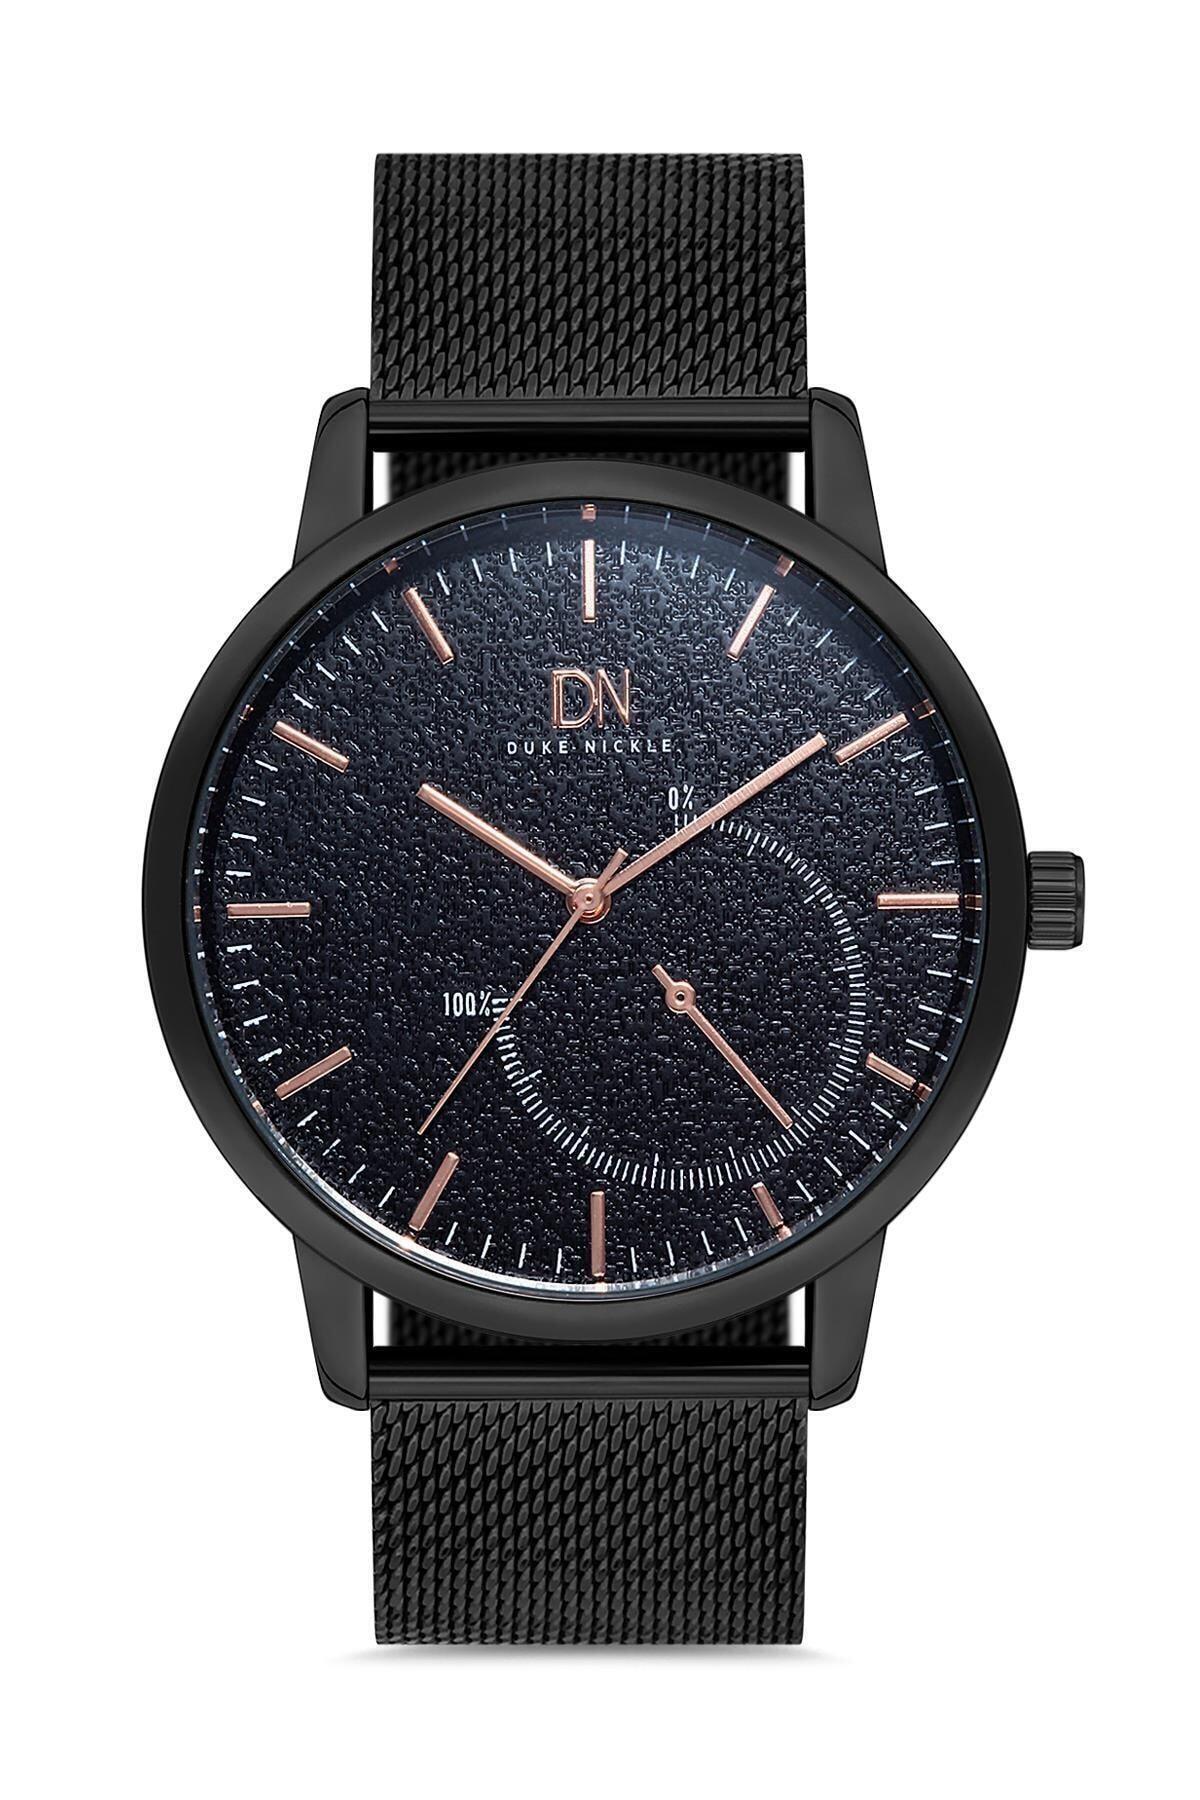 Duke Nickle Deh1c2 Erkek Kol Saati Hasır Siyah 1